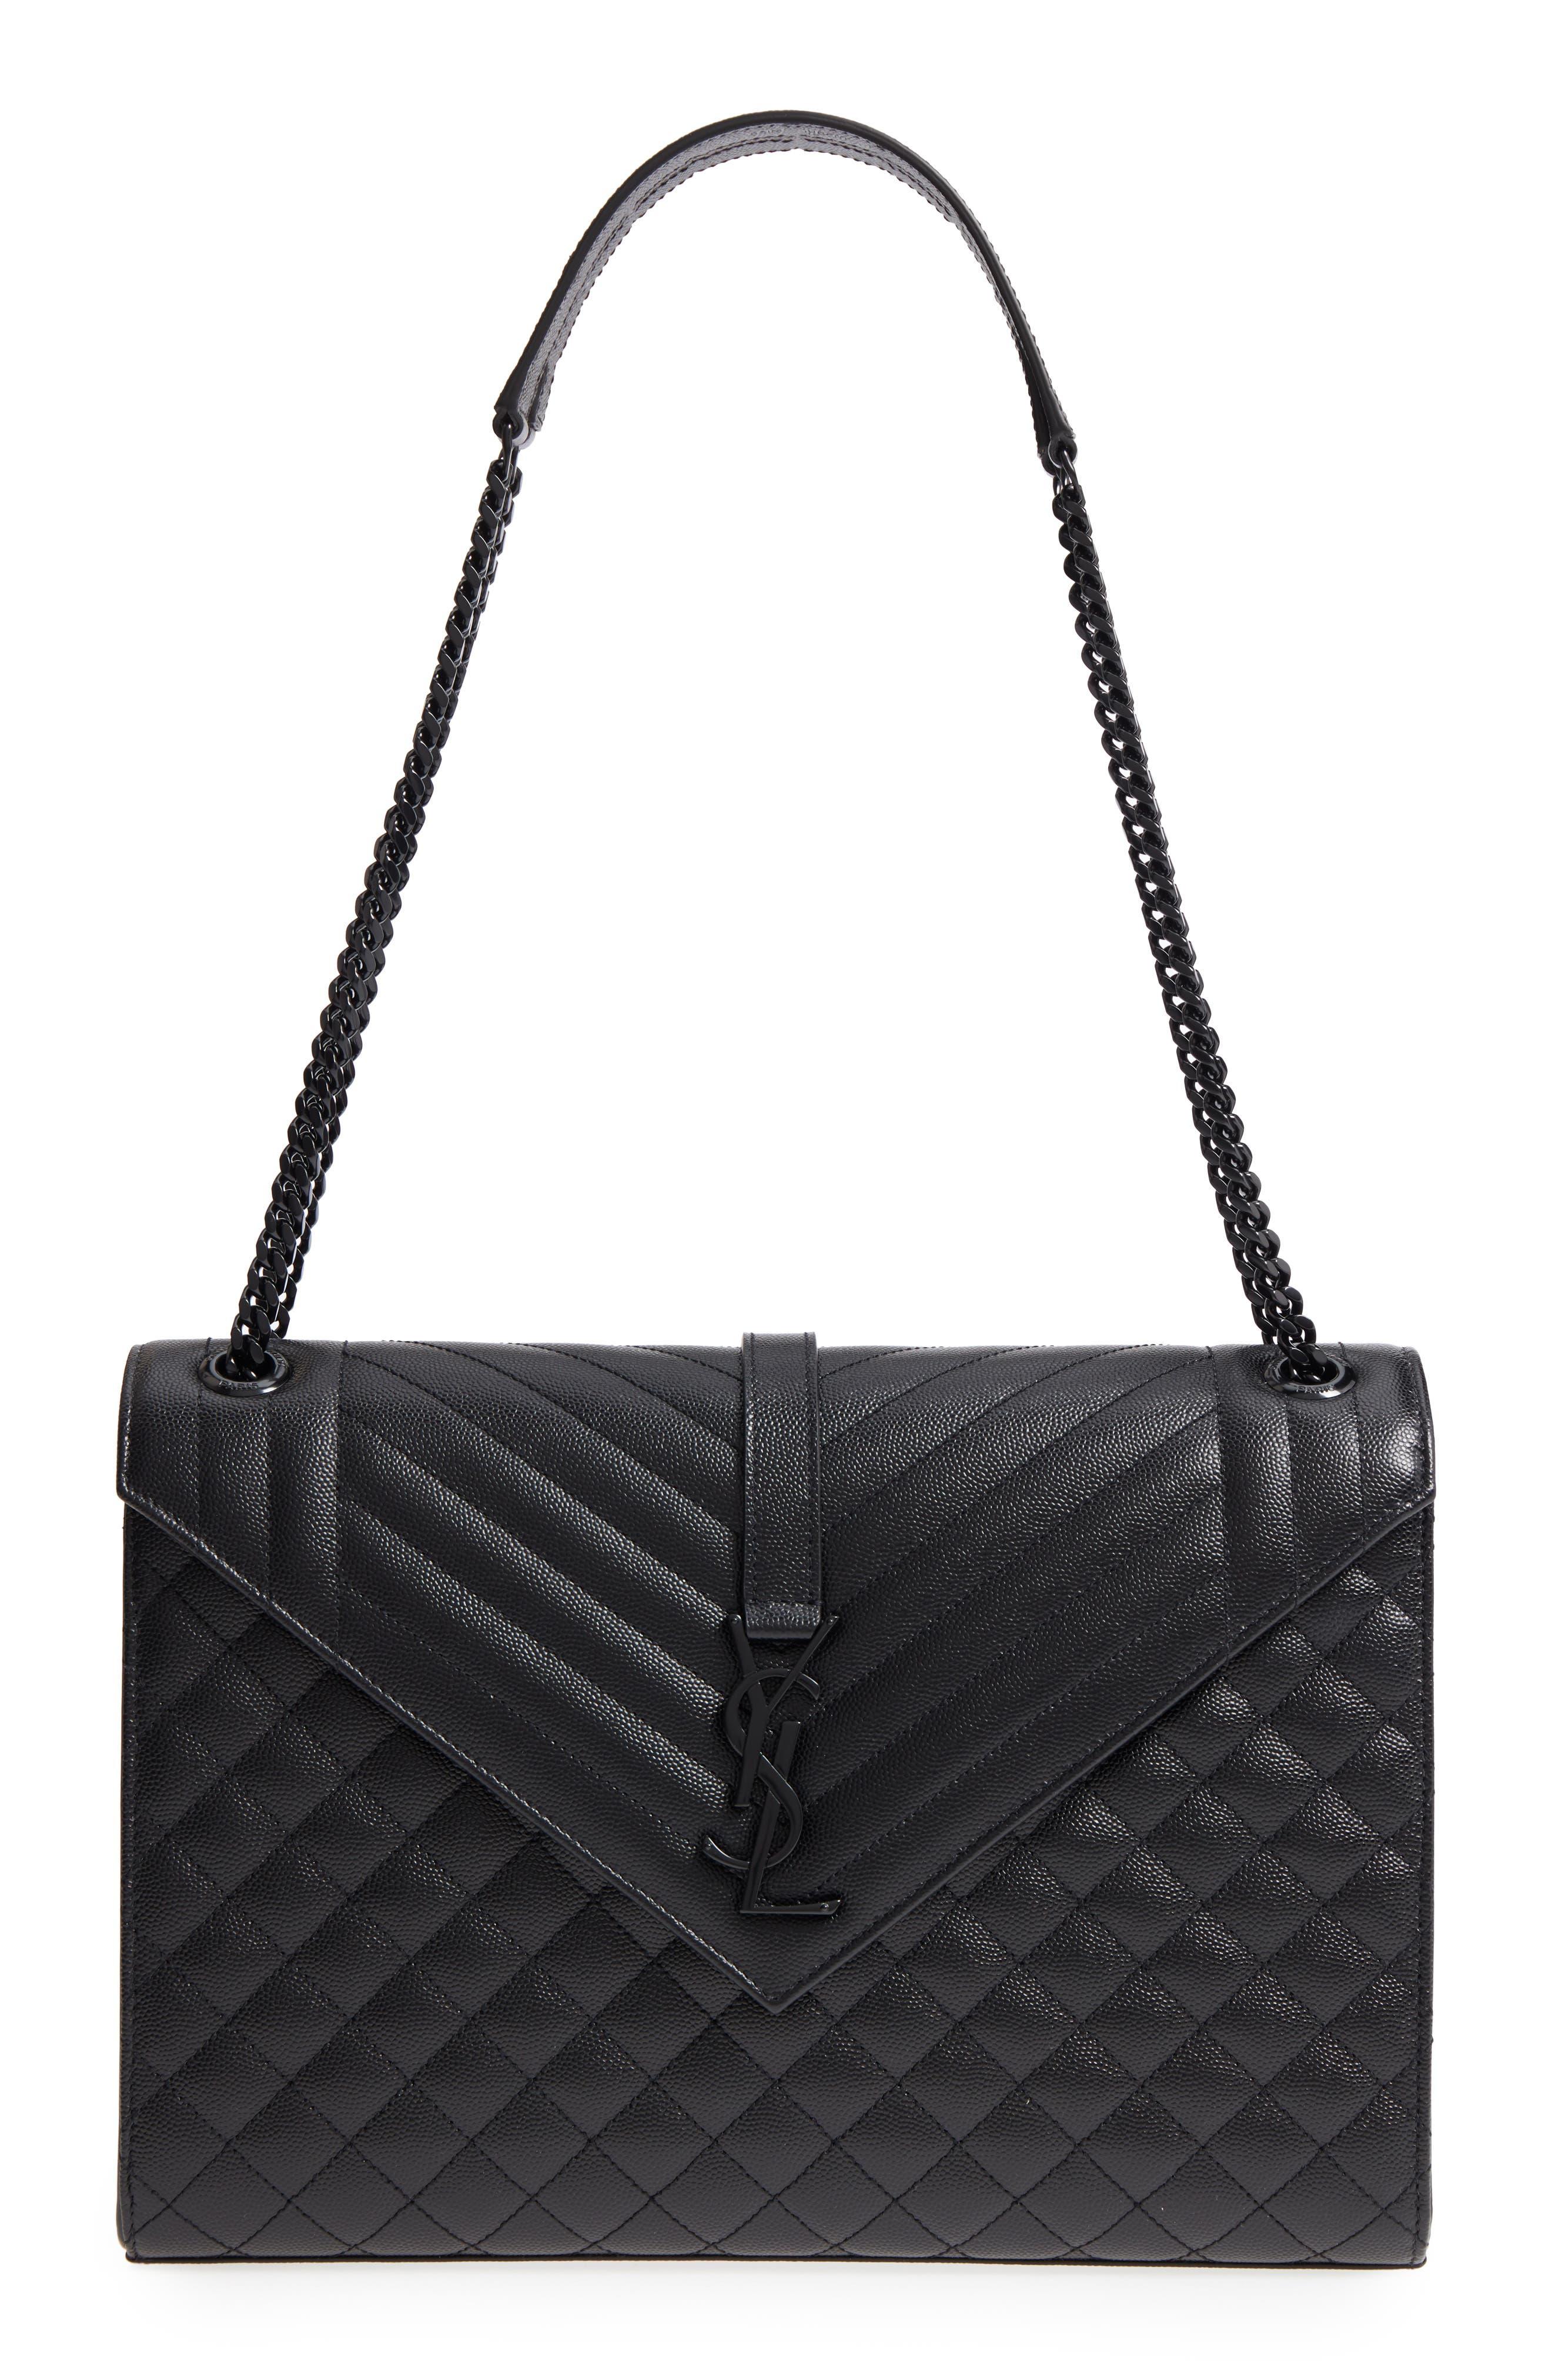 Large Cassandra Calfskin Shoulder Bag,                         Main,                         color, NERO/ NERO/ NERO